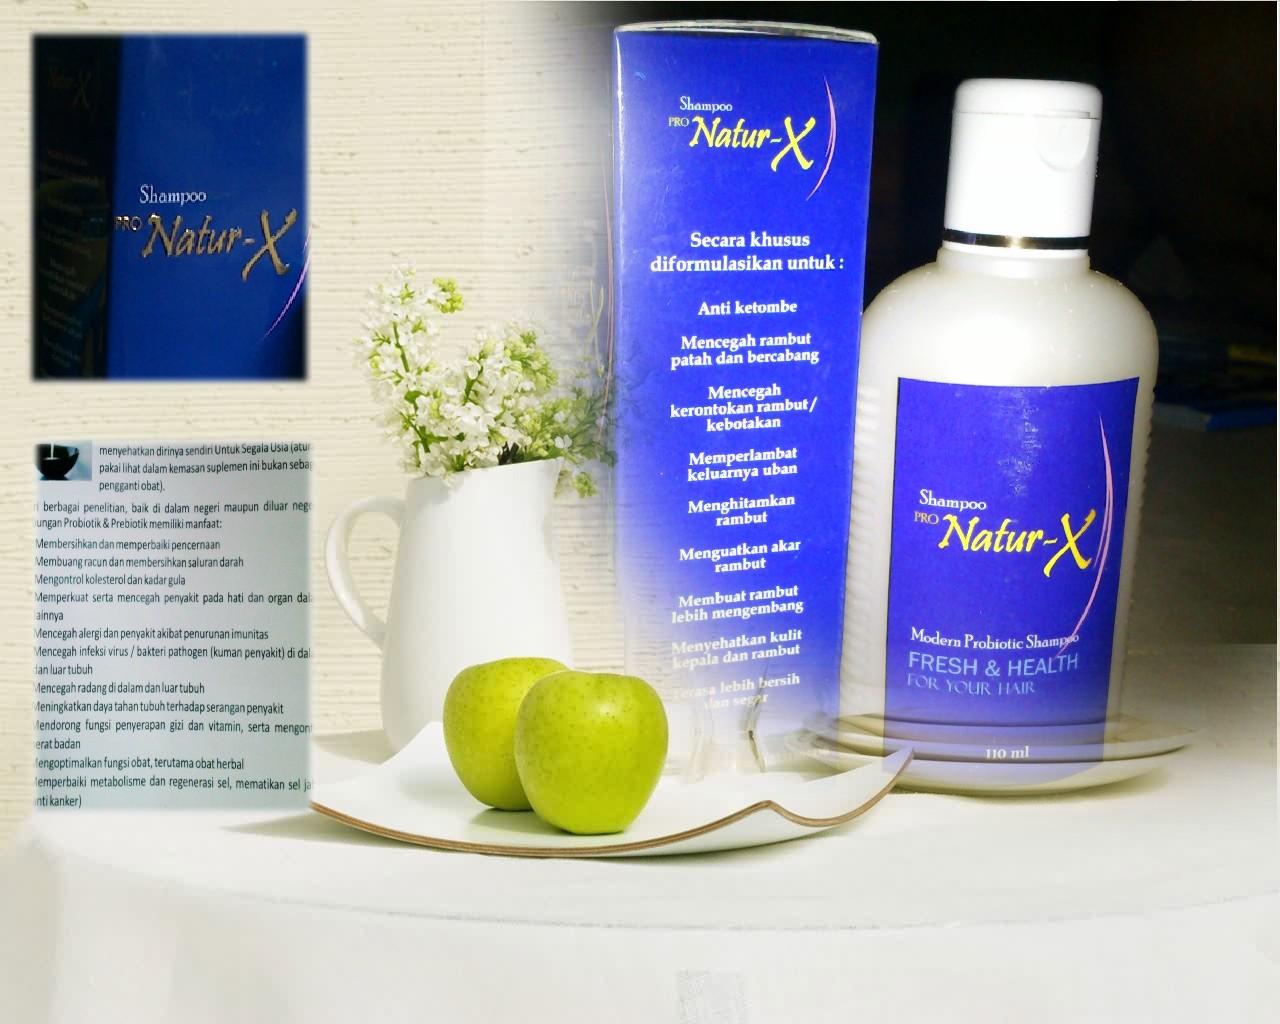 Shampo Pro Natur X Shampo Probiotik TH Online